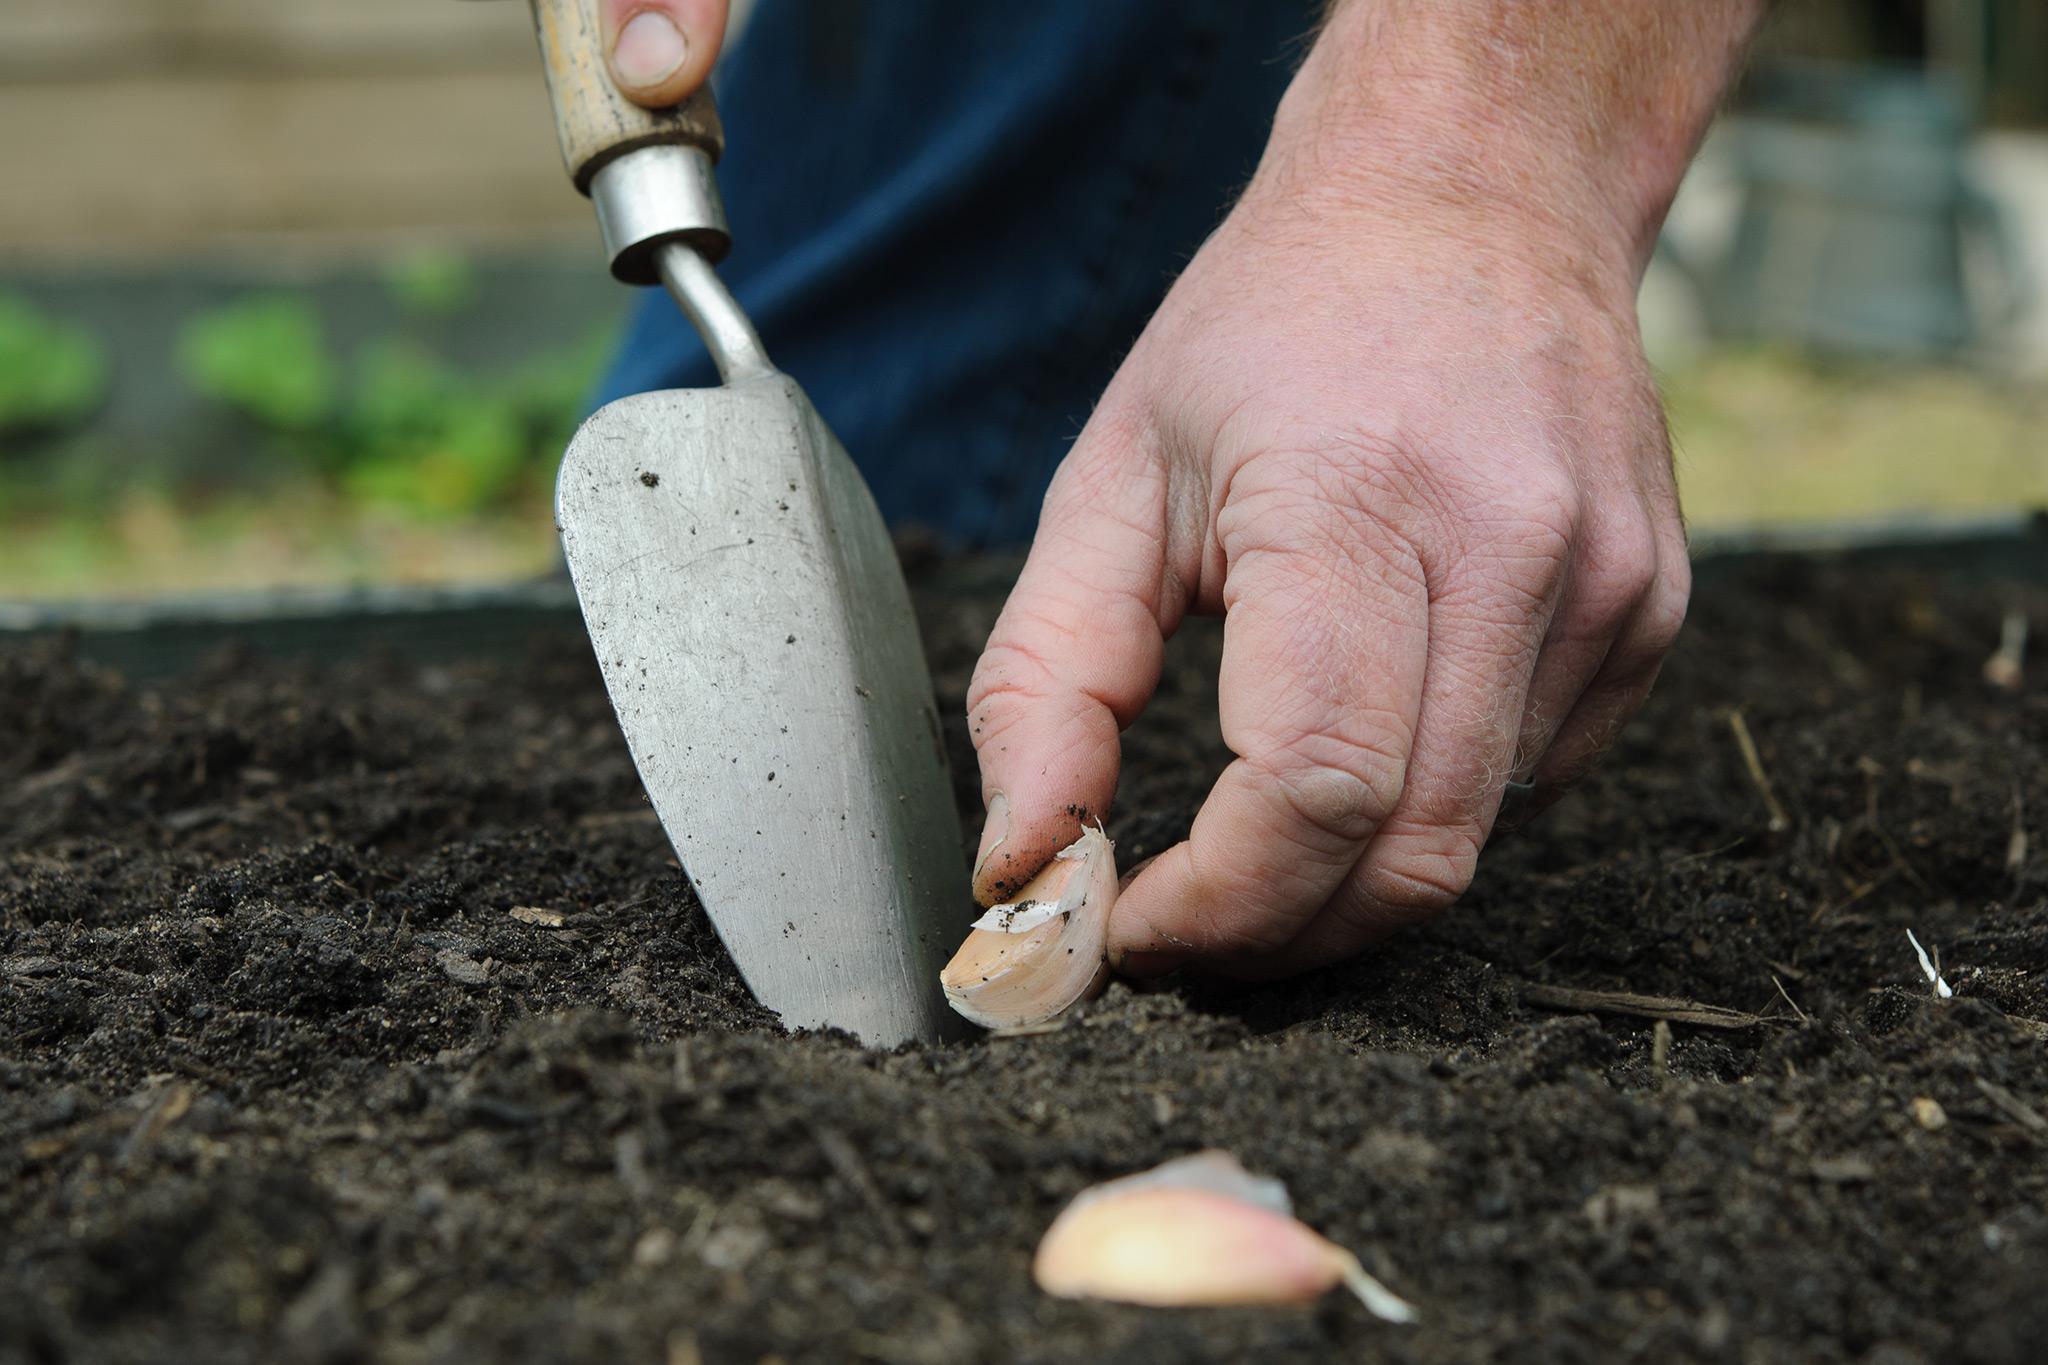 planting-garlic-cloves-outdoors-2